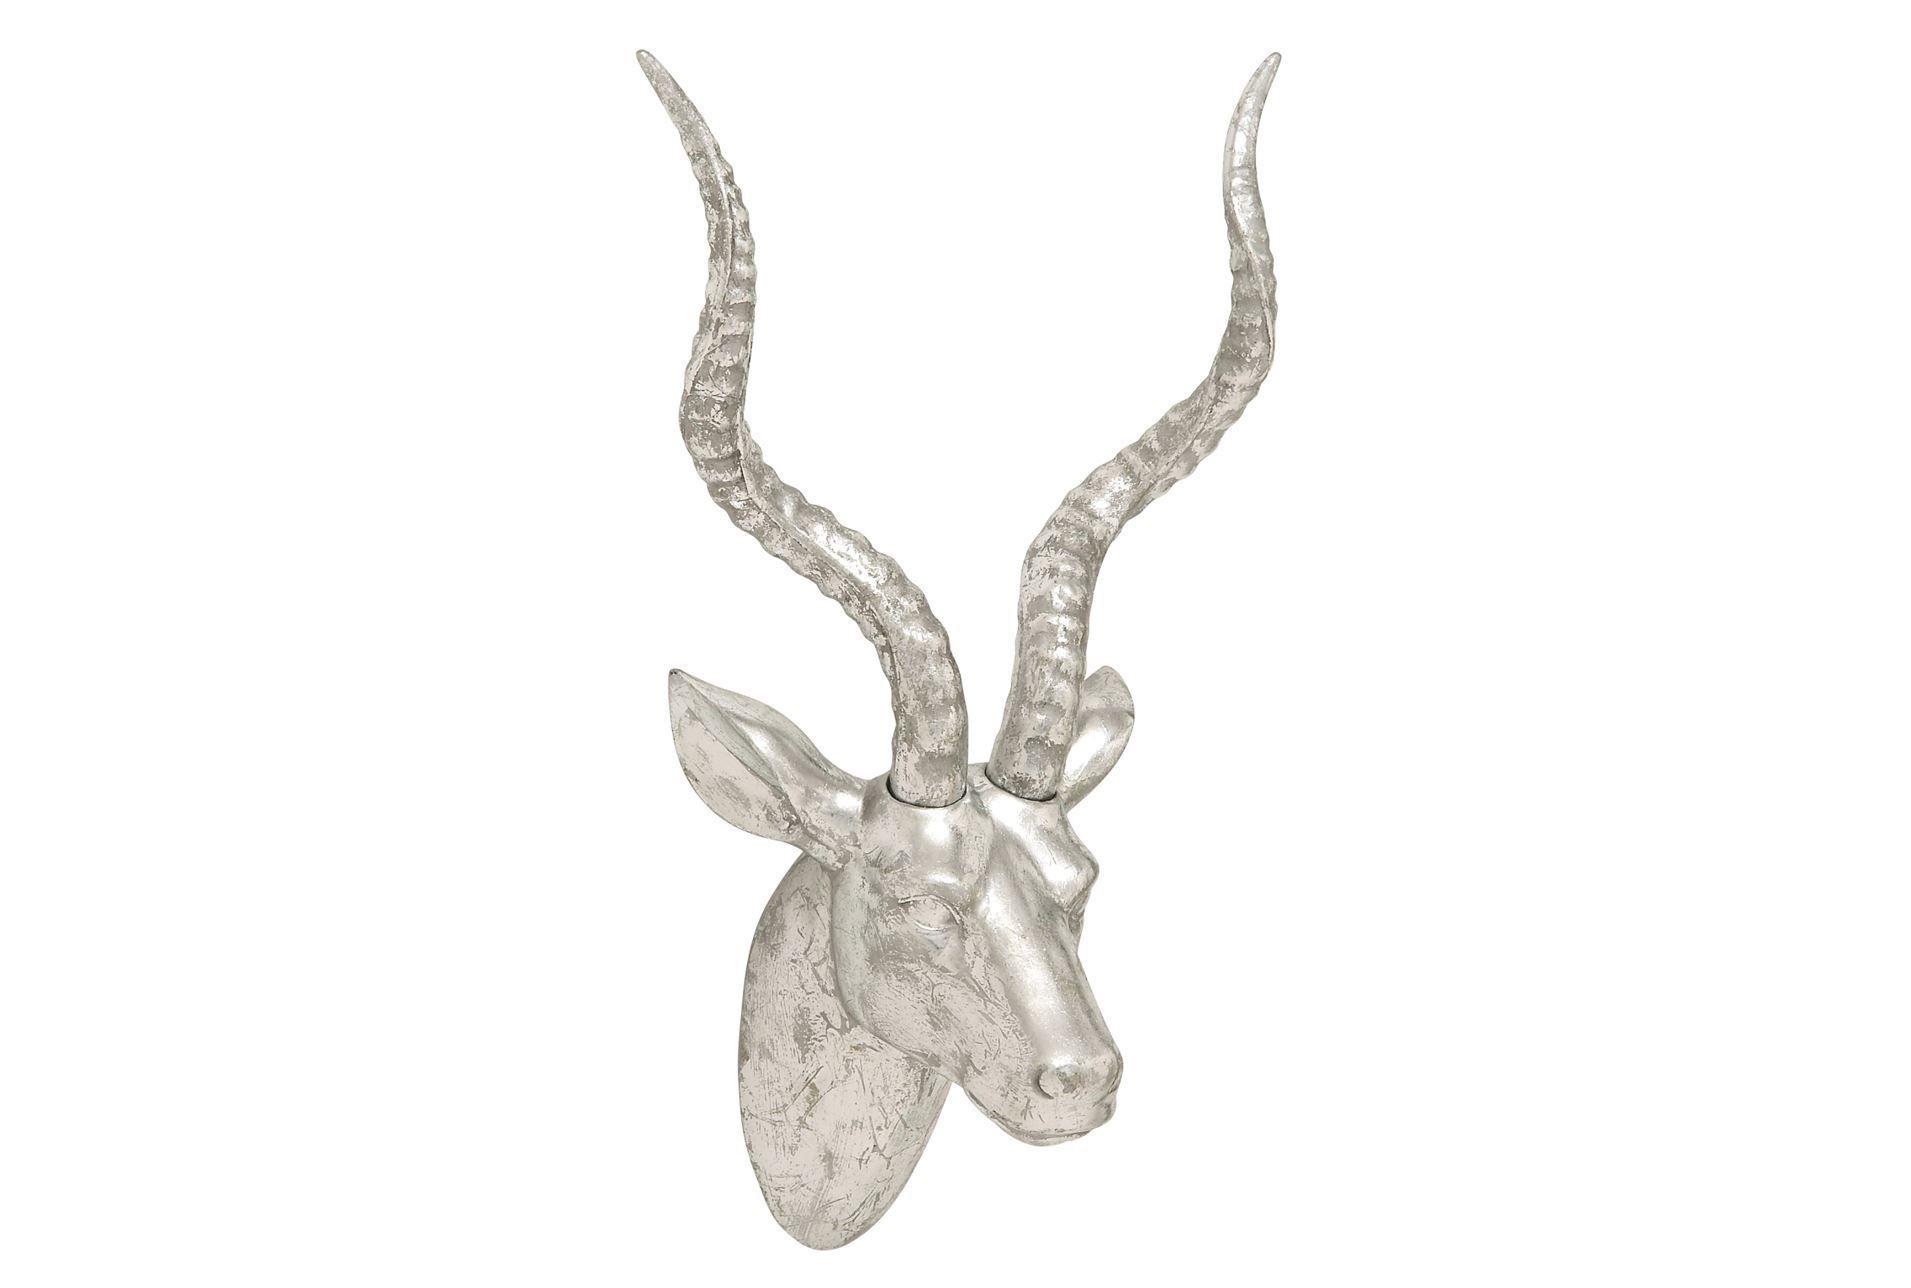 20 Inch Silver Gazelle Head | Design | Wall Decor, Decor Throughout Highlands Ranch The Templeton Wall Decor (View 2 of 30)